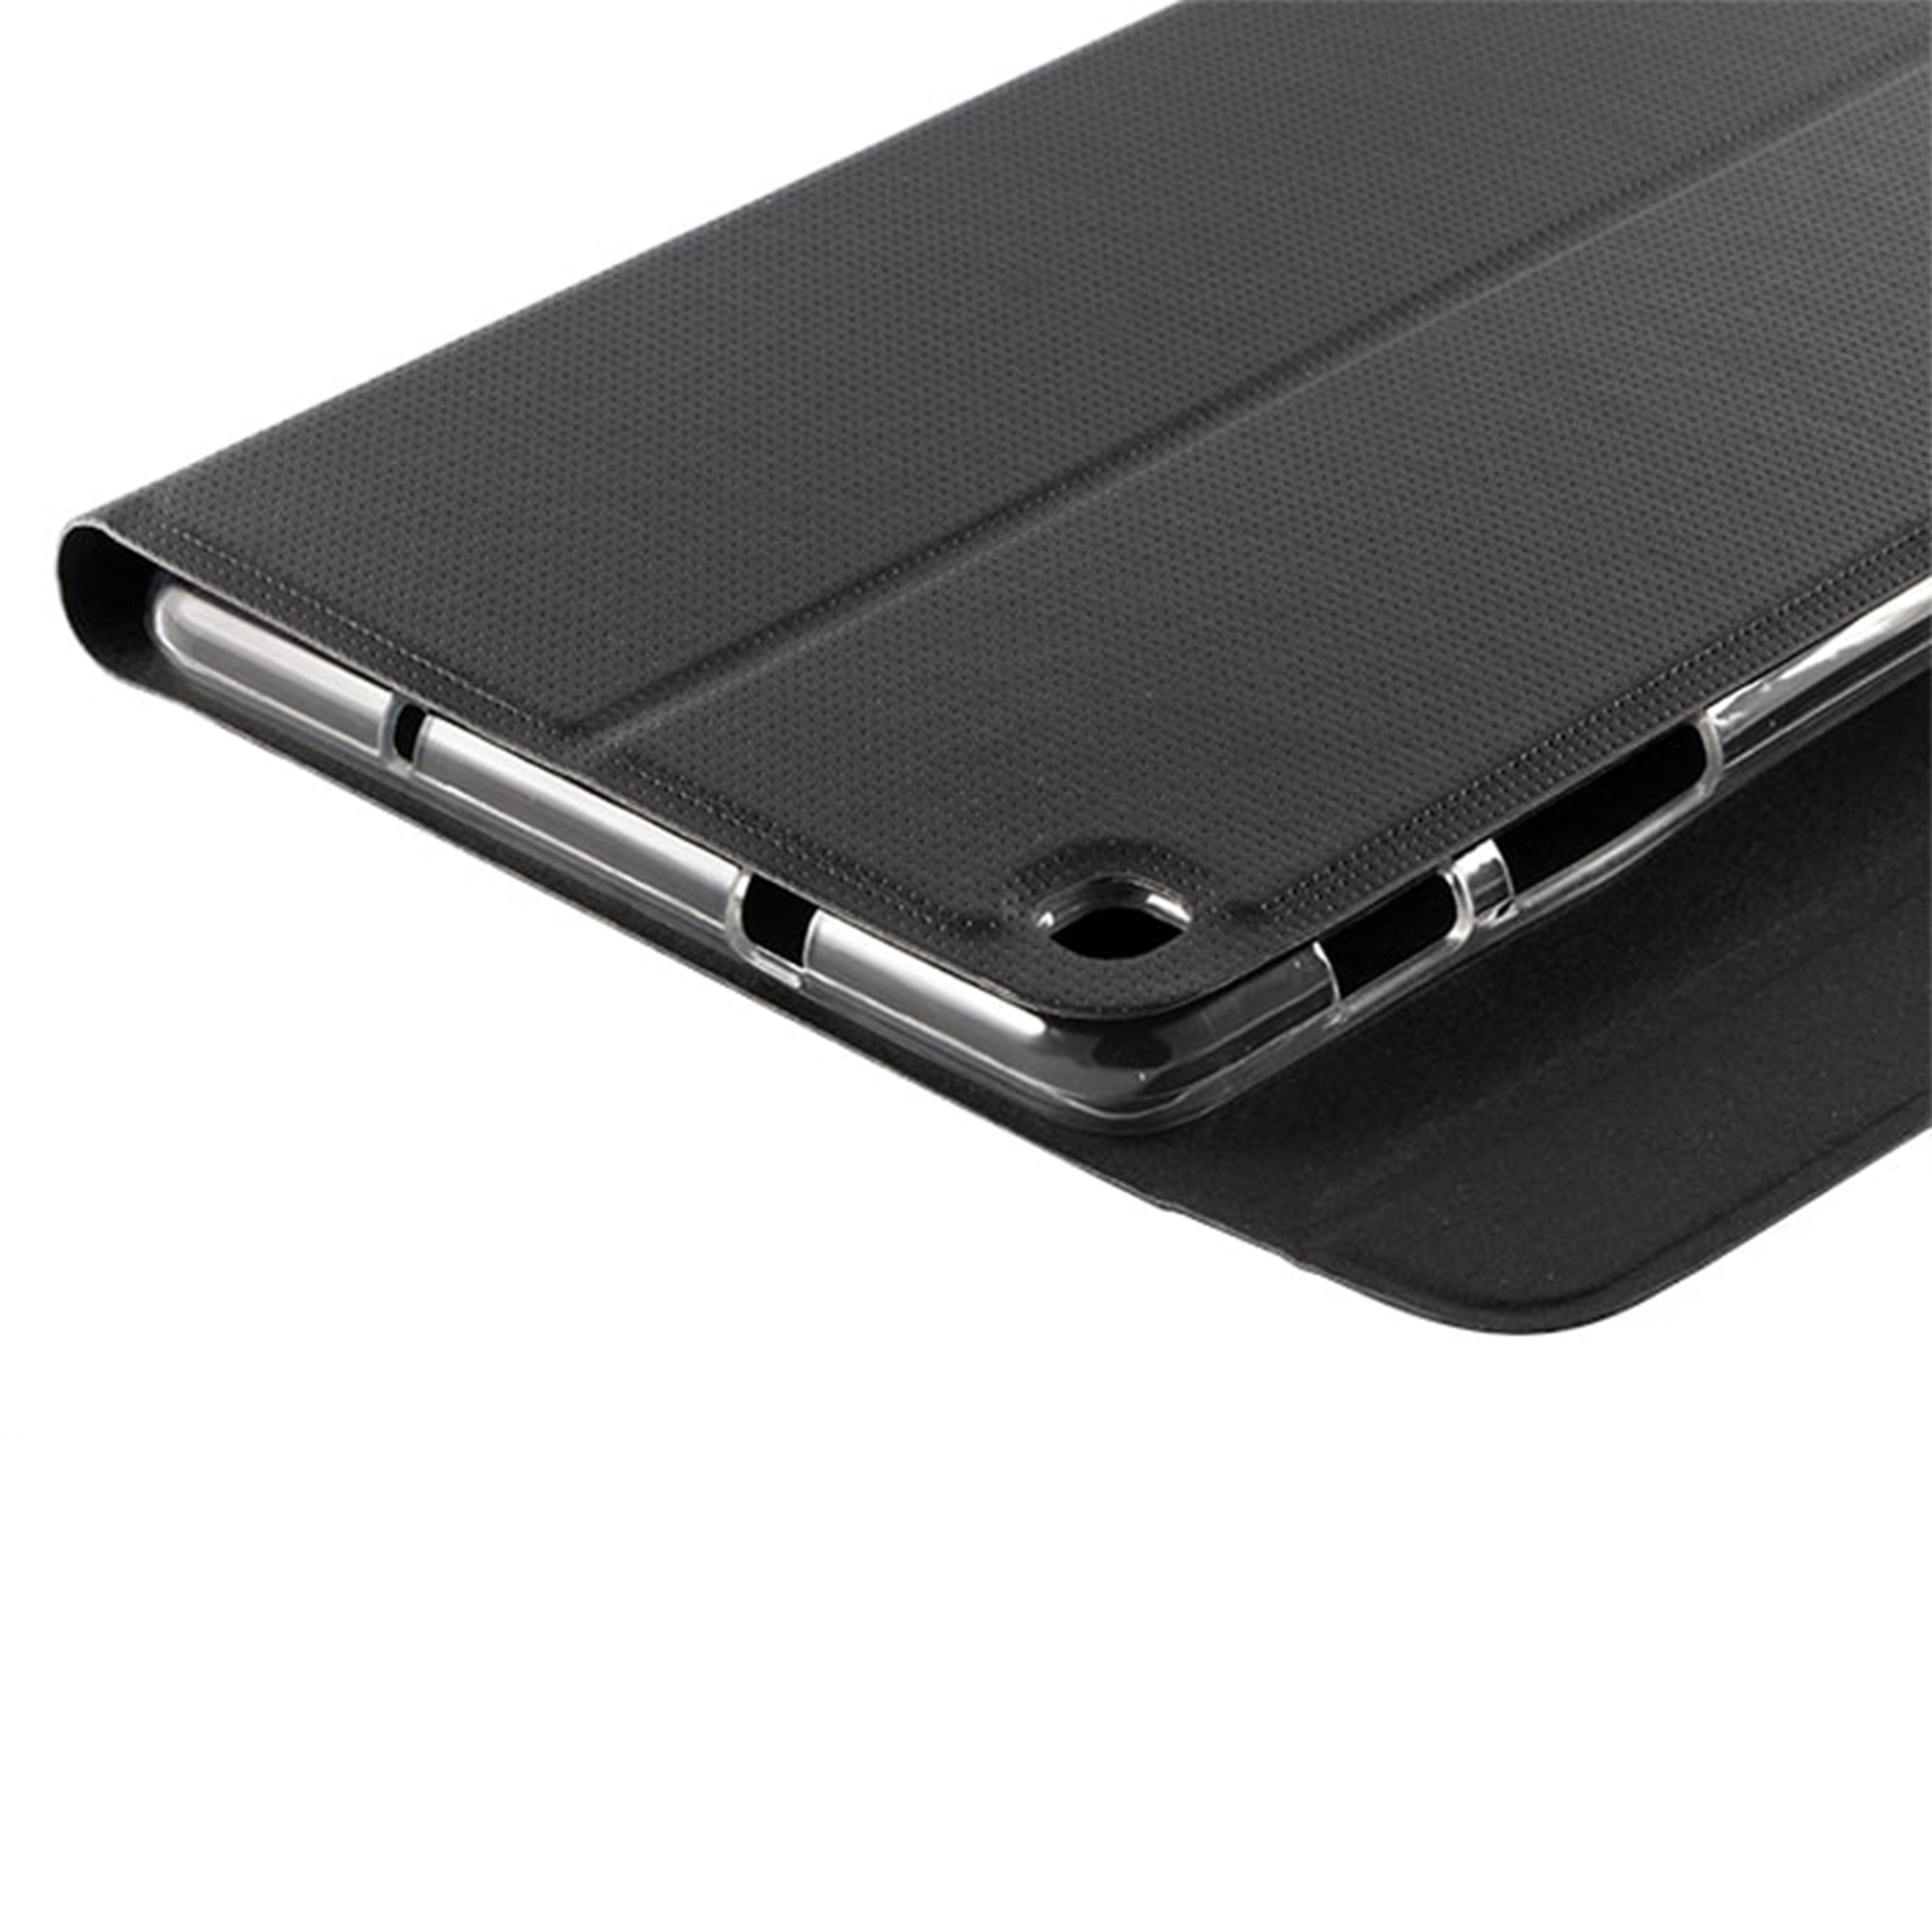 کیف محافظ تبلت سامسونگ Book Cover Samsung Galaxy Tab A P205